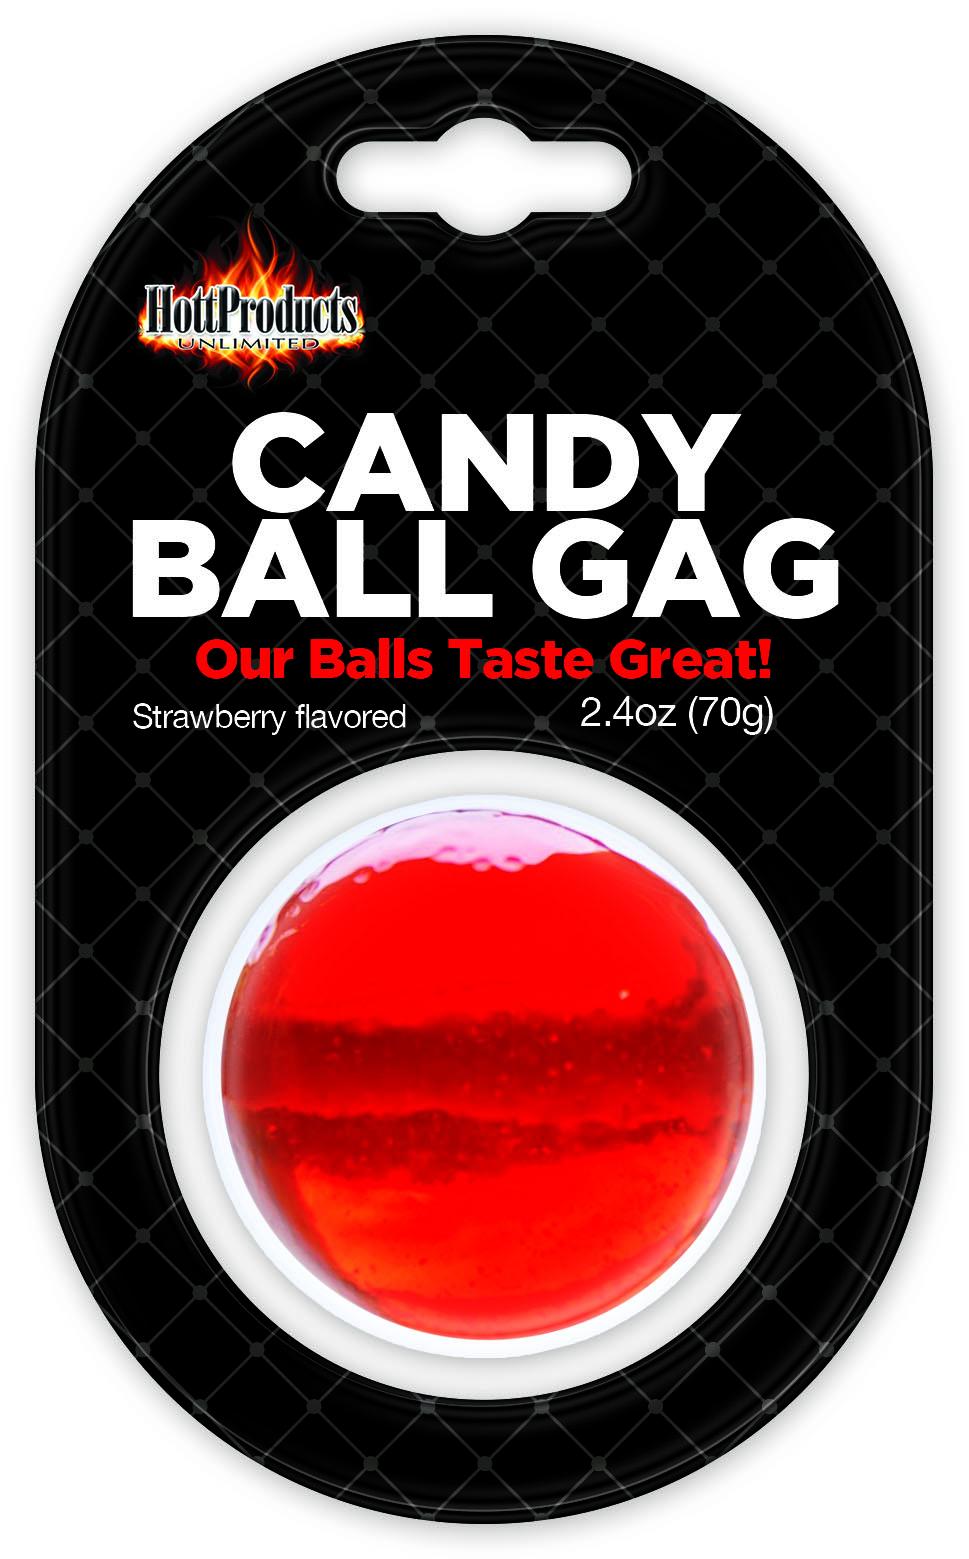 CANDY BALL GAG STRAWBERRY